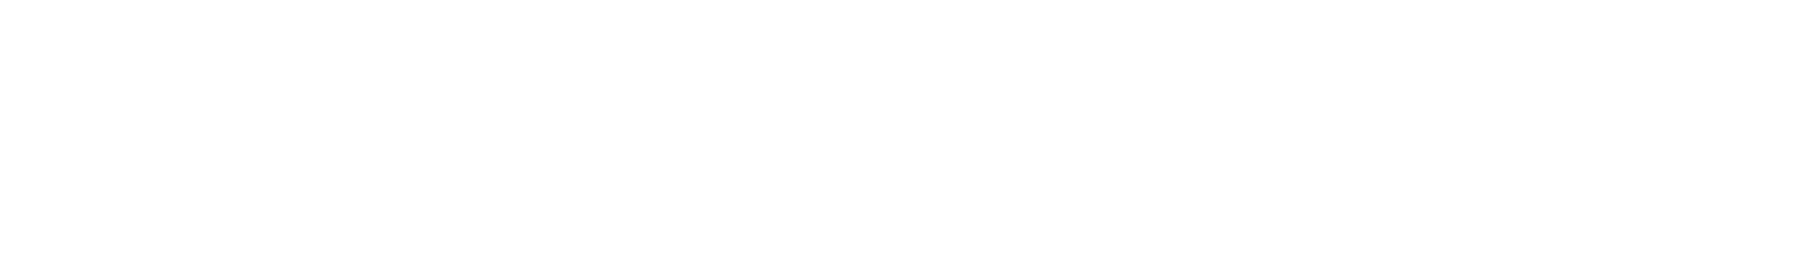 seq4 120